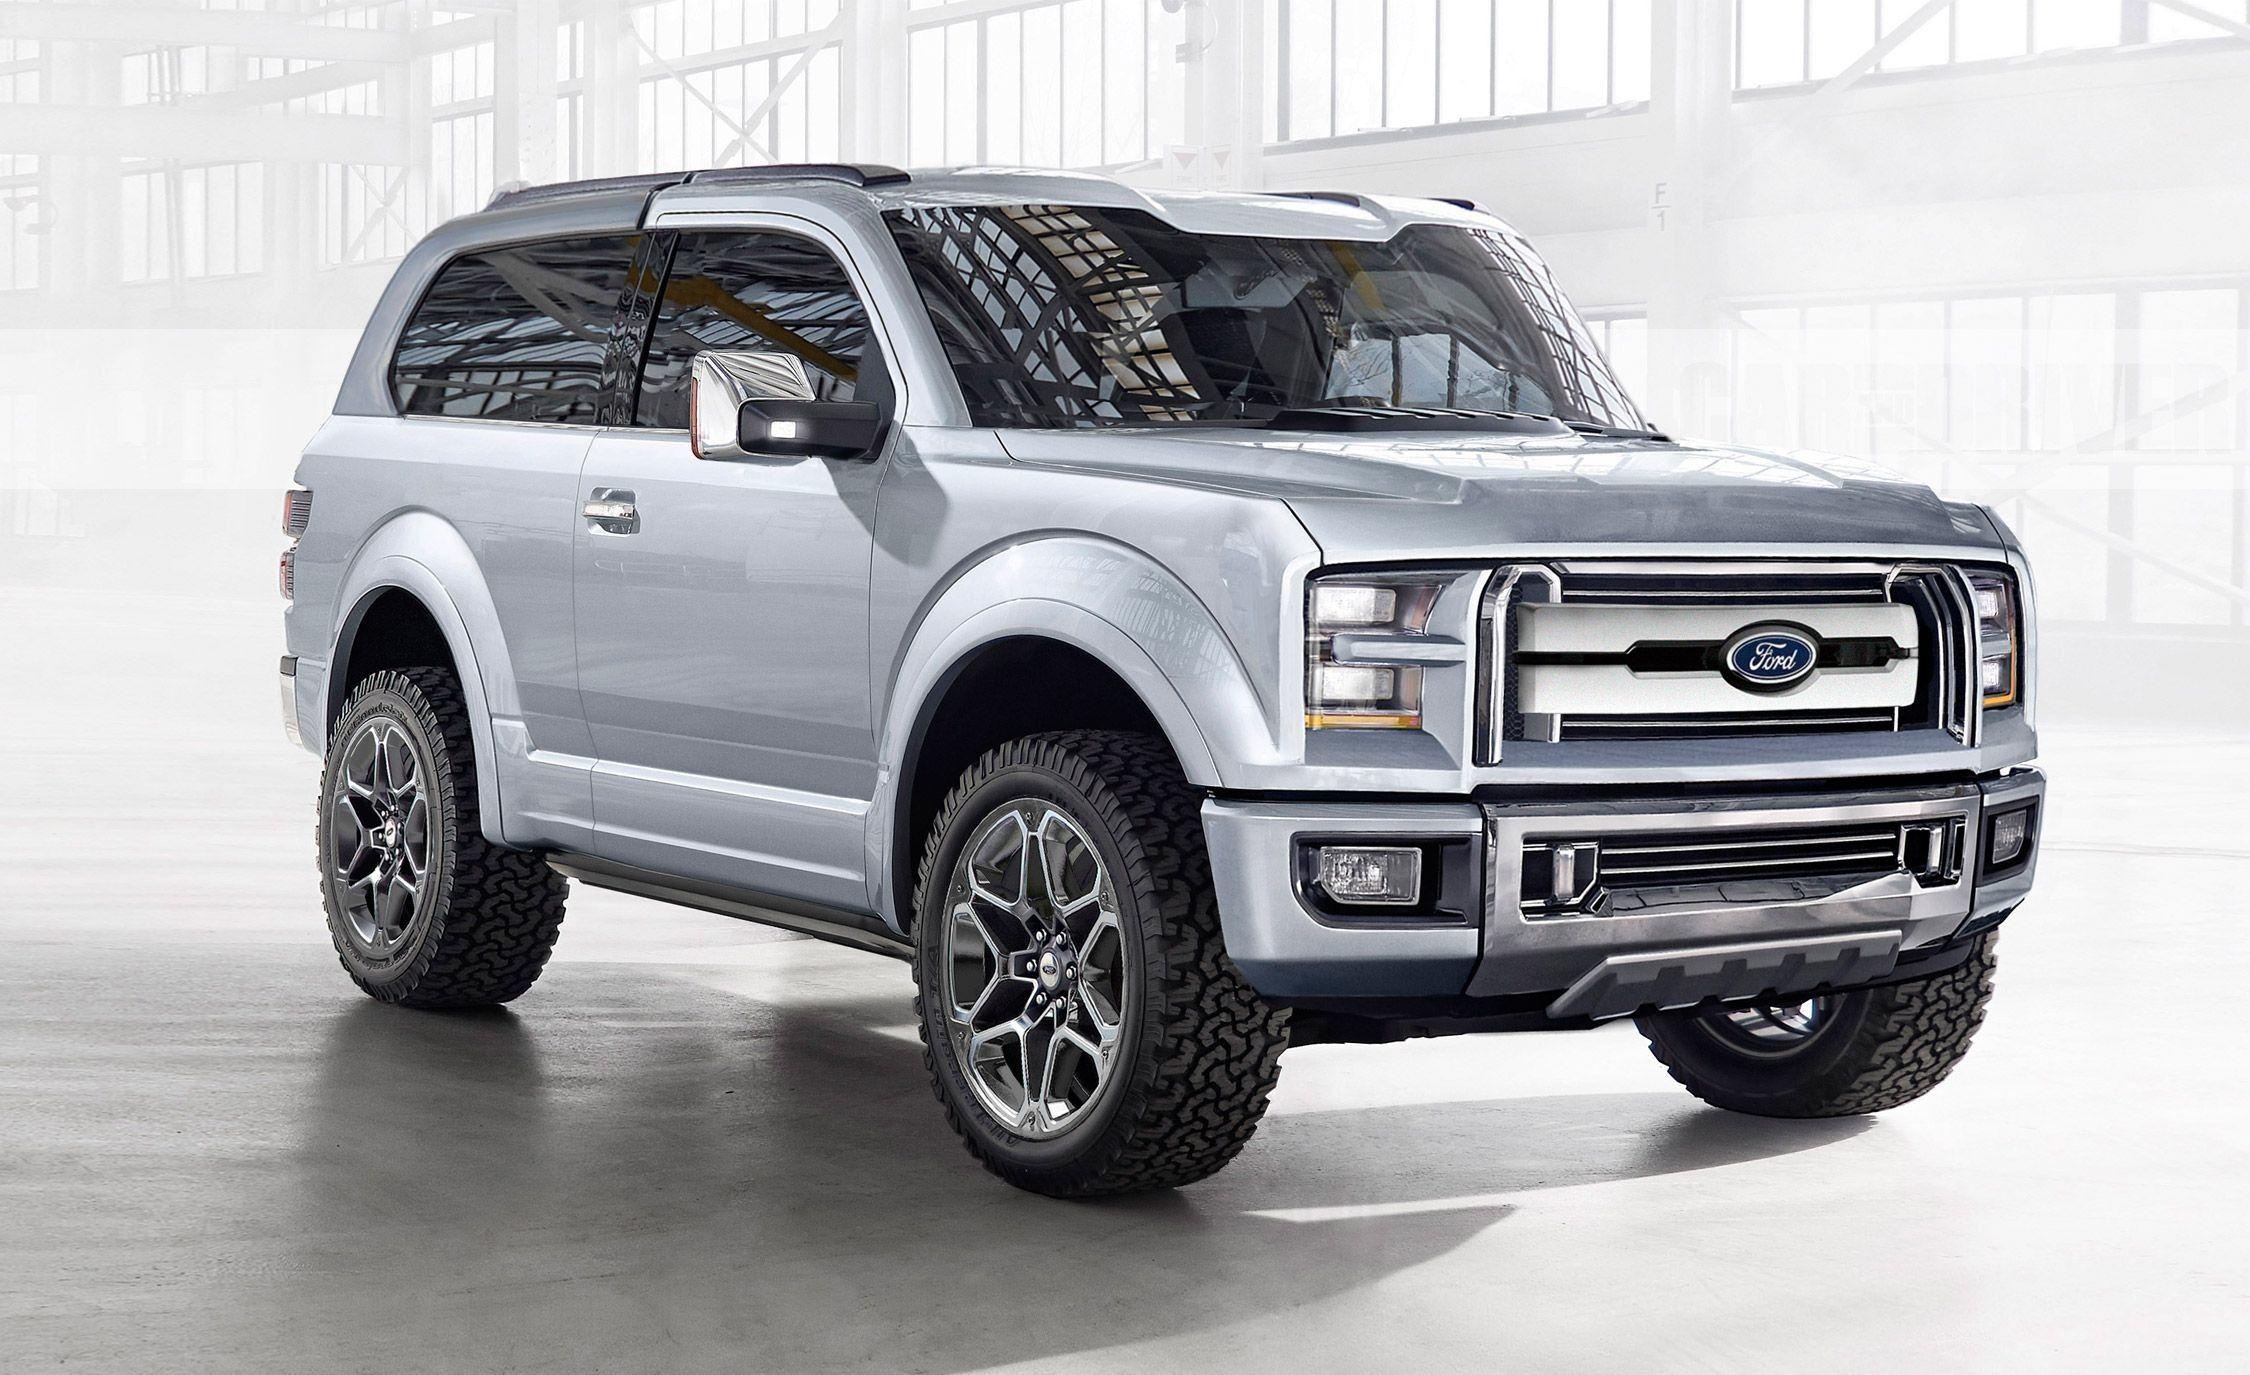 Ford Bronco 2020 Price Redesign Di 2020 Ford Bronco Truk Ford Suv